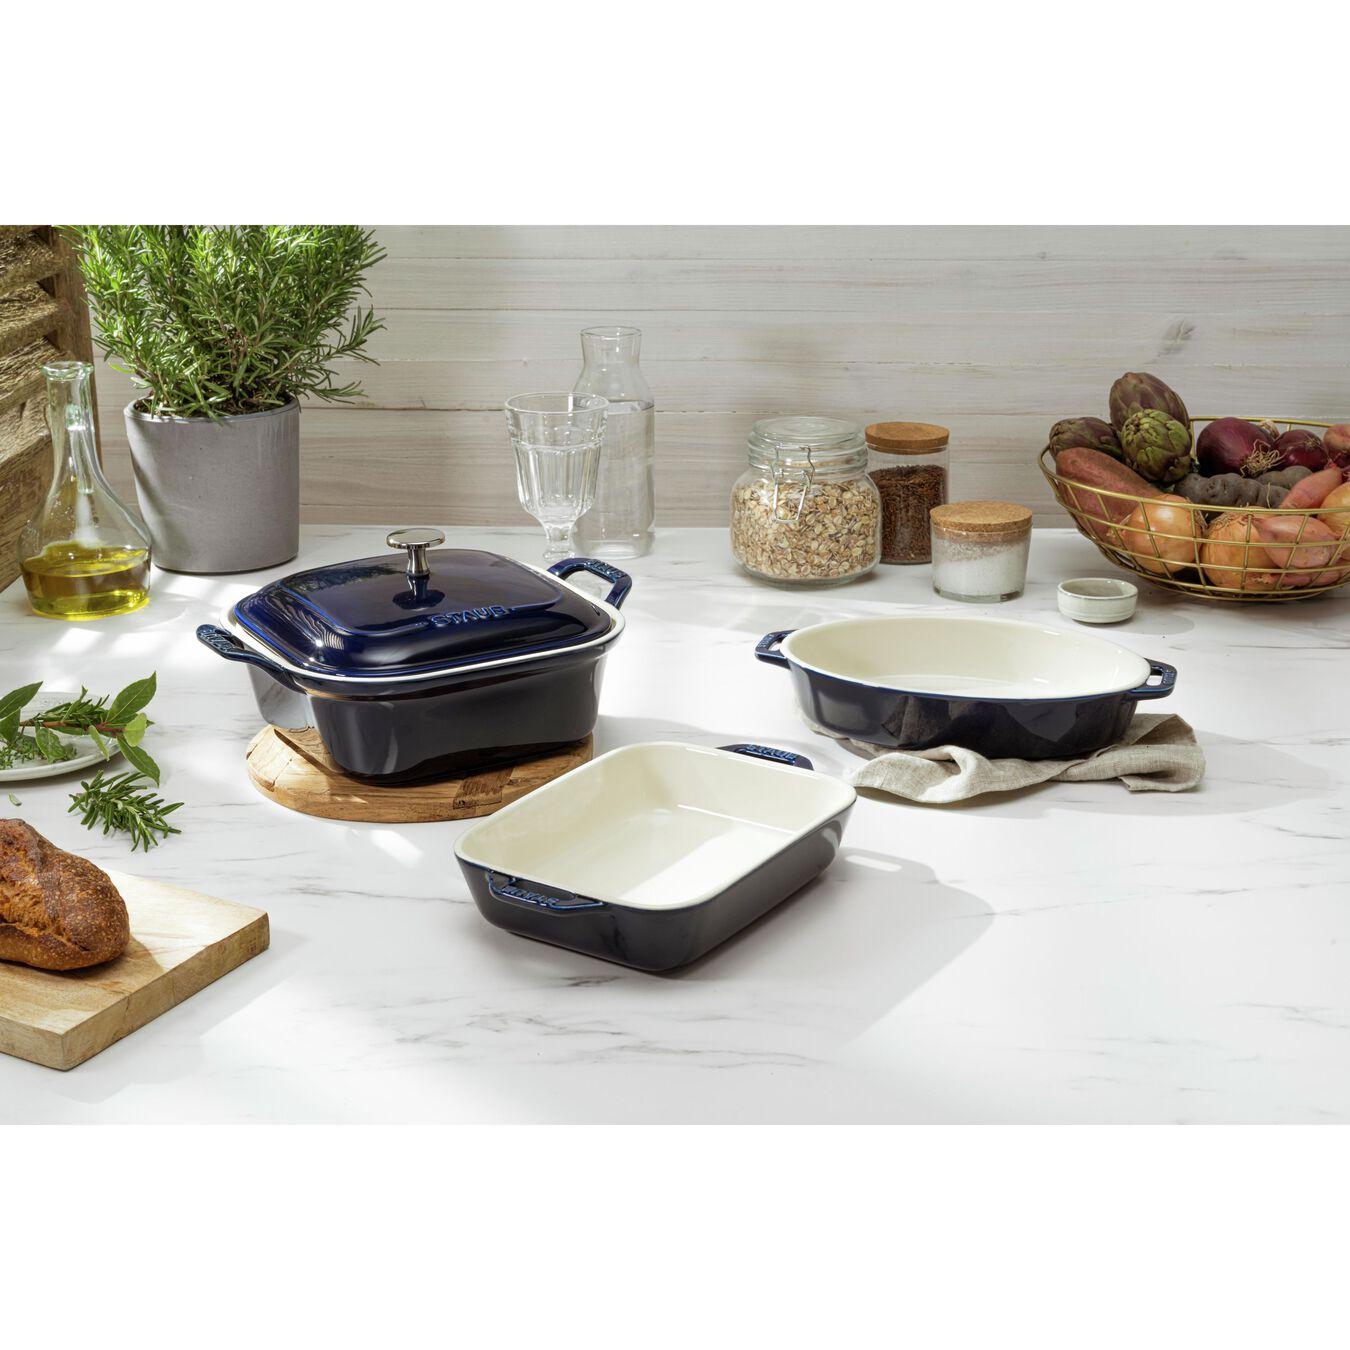 Ovenware set, 4 Piece | dark-blue,,large 7